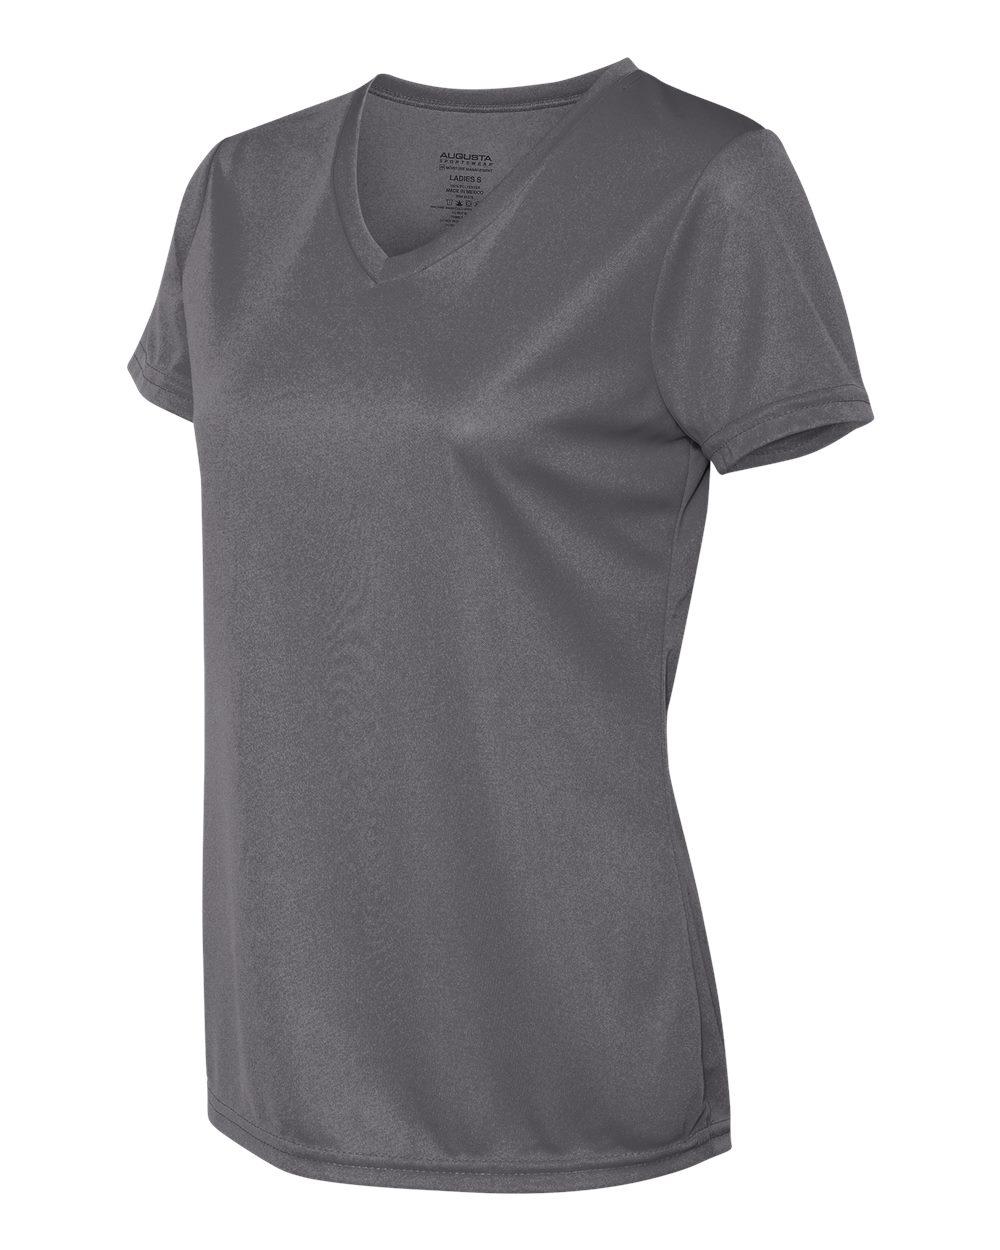 Augusta-Sportswear-Women-039-s-Moisture-Wicking-V-Neck-T-Shirt-1790-XS-2XL thumbnail 12